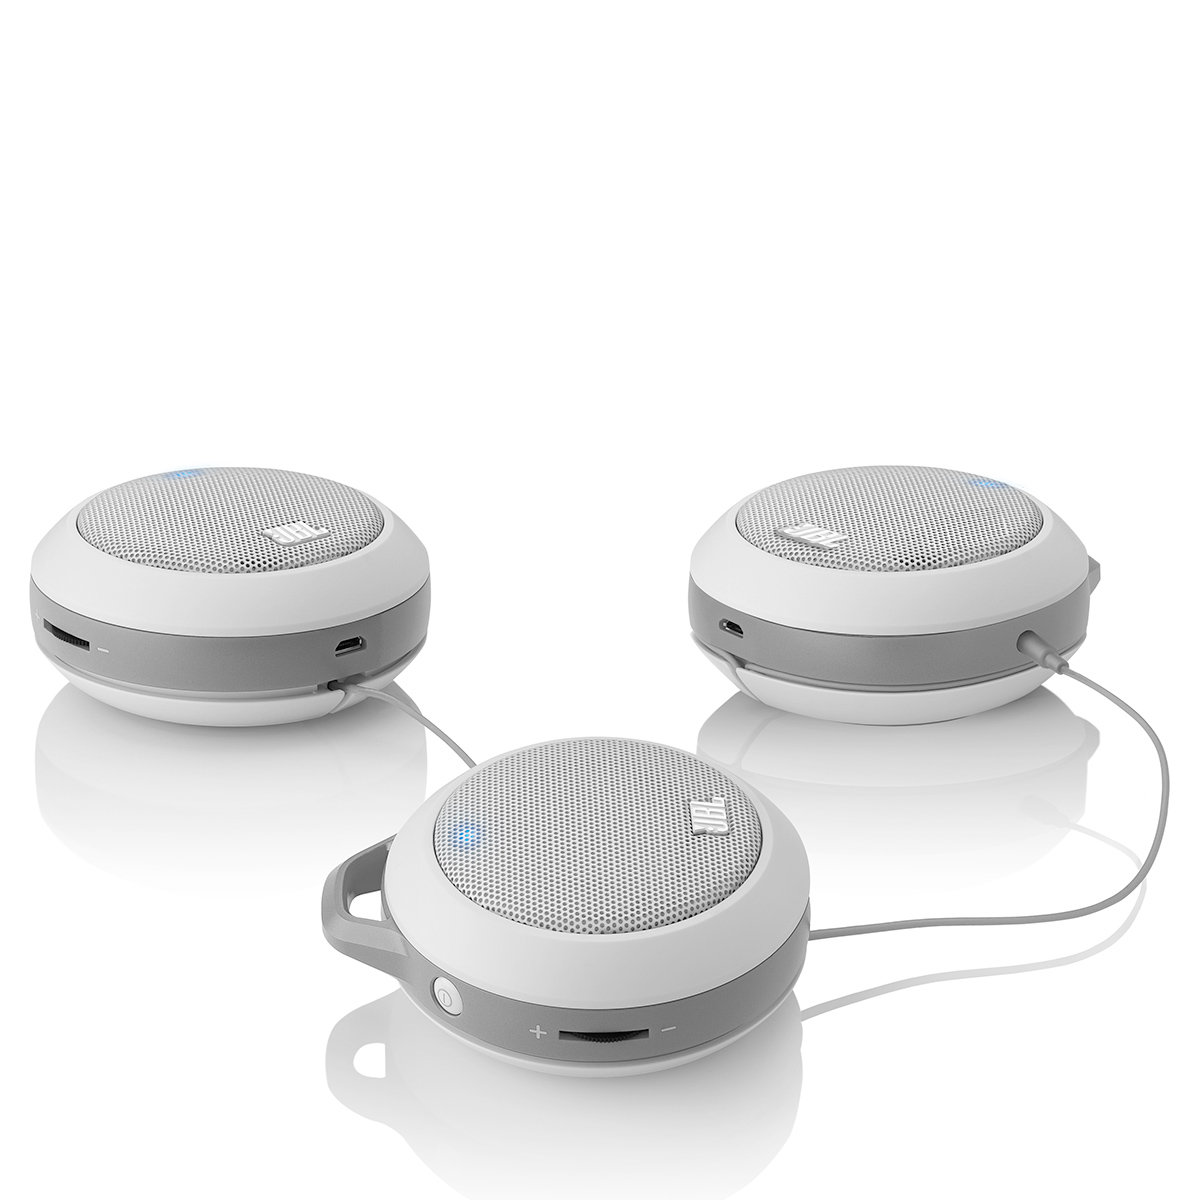 JBL Micro II Ultra Portable Multimedia Speaker Orange